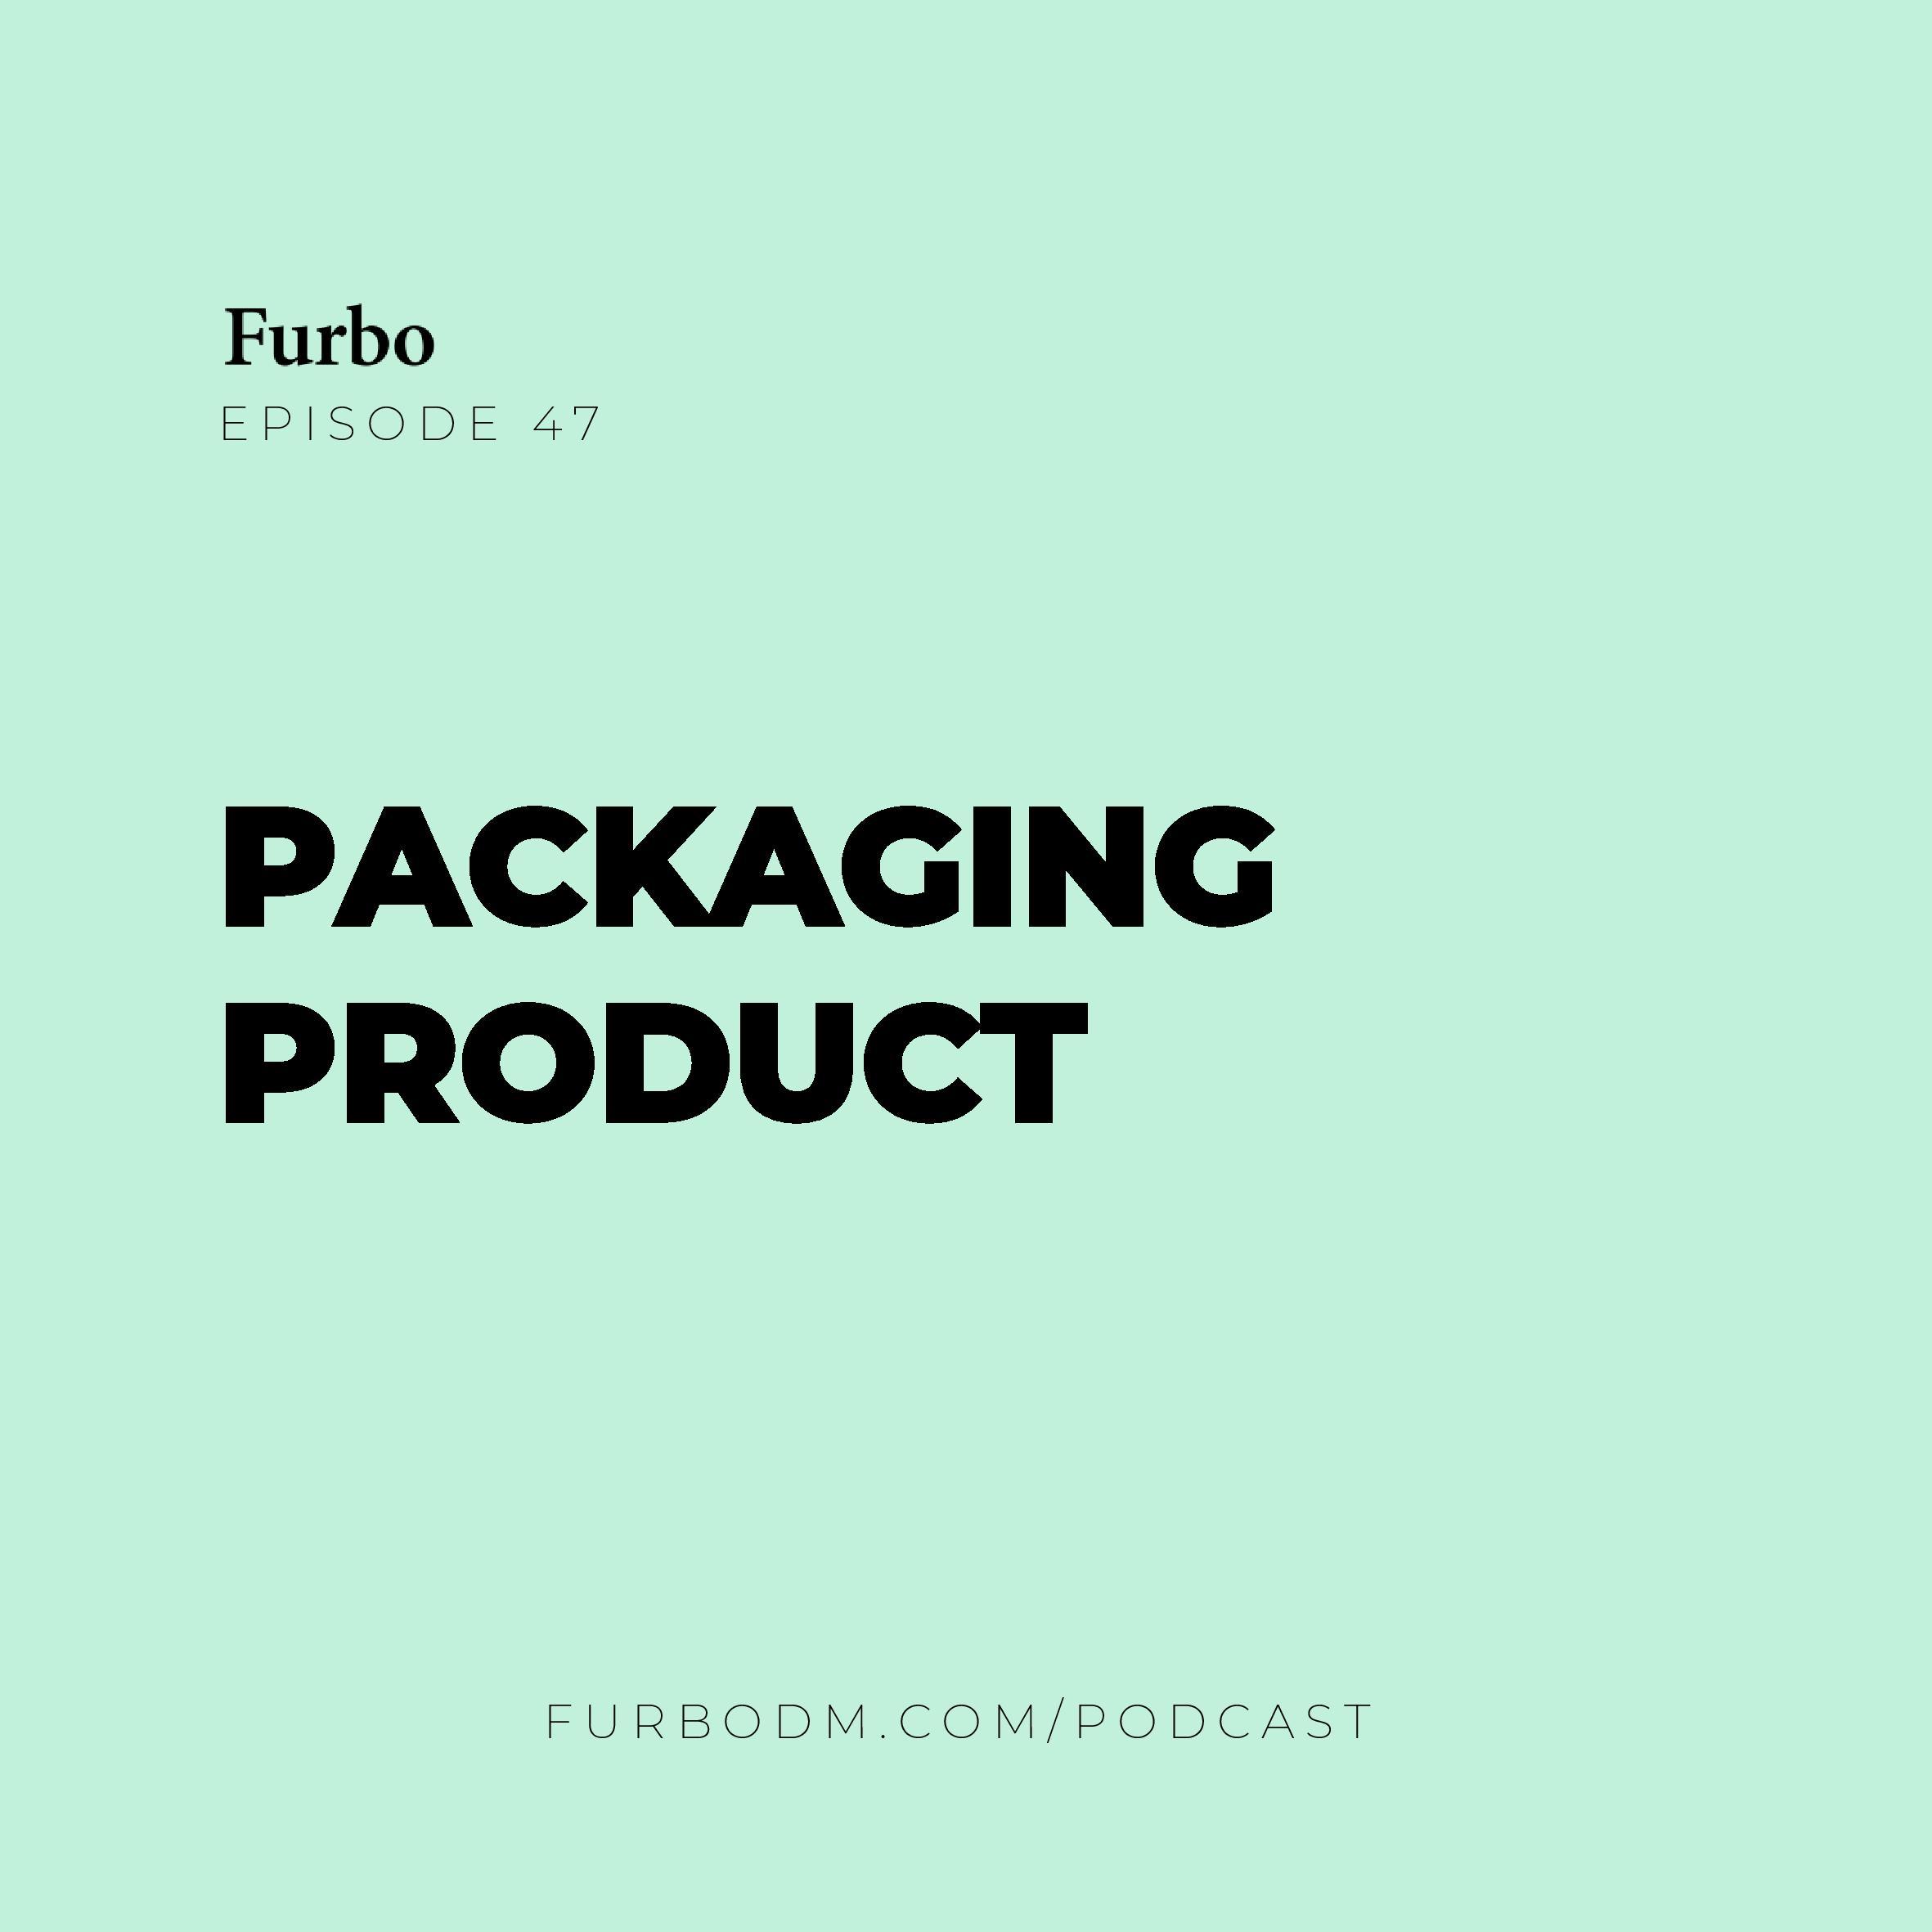 E47: Product Packaging | بسته بندی و ارسال محصول در فروشگاه اینترنتی چگونه است؟